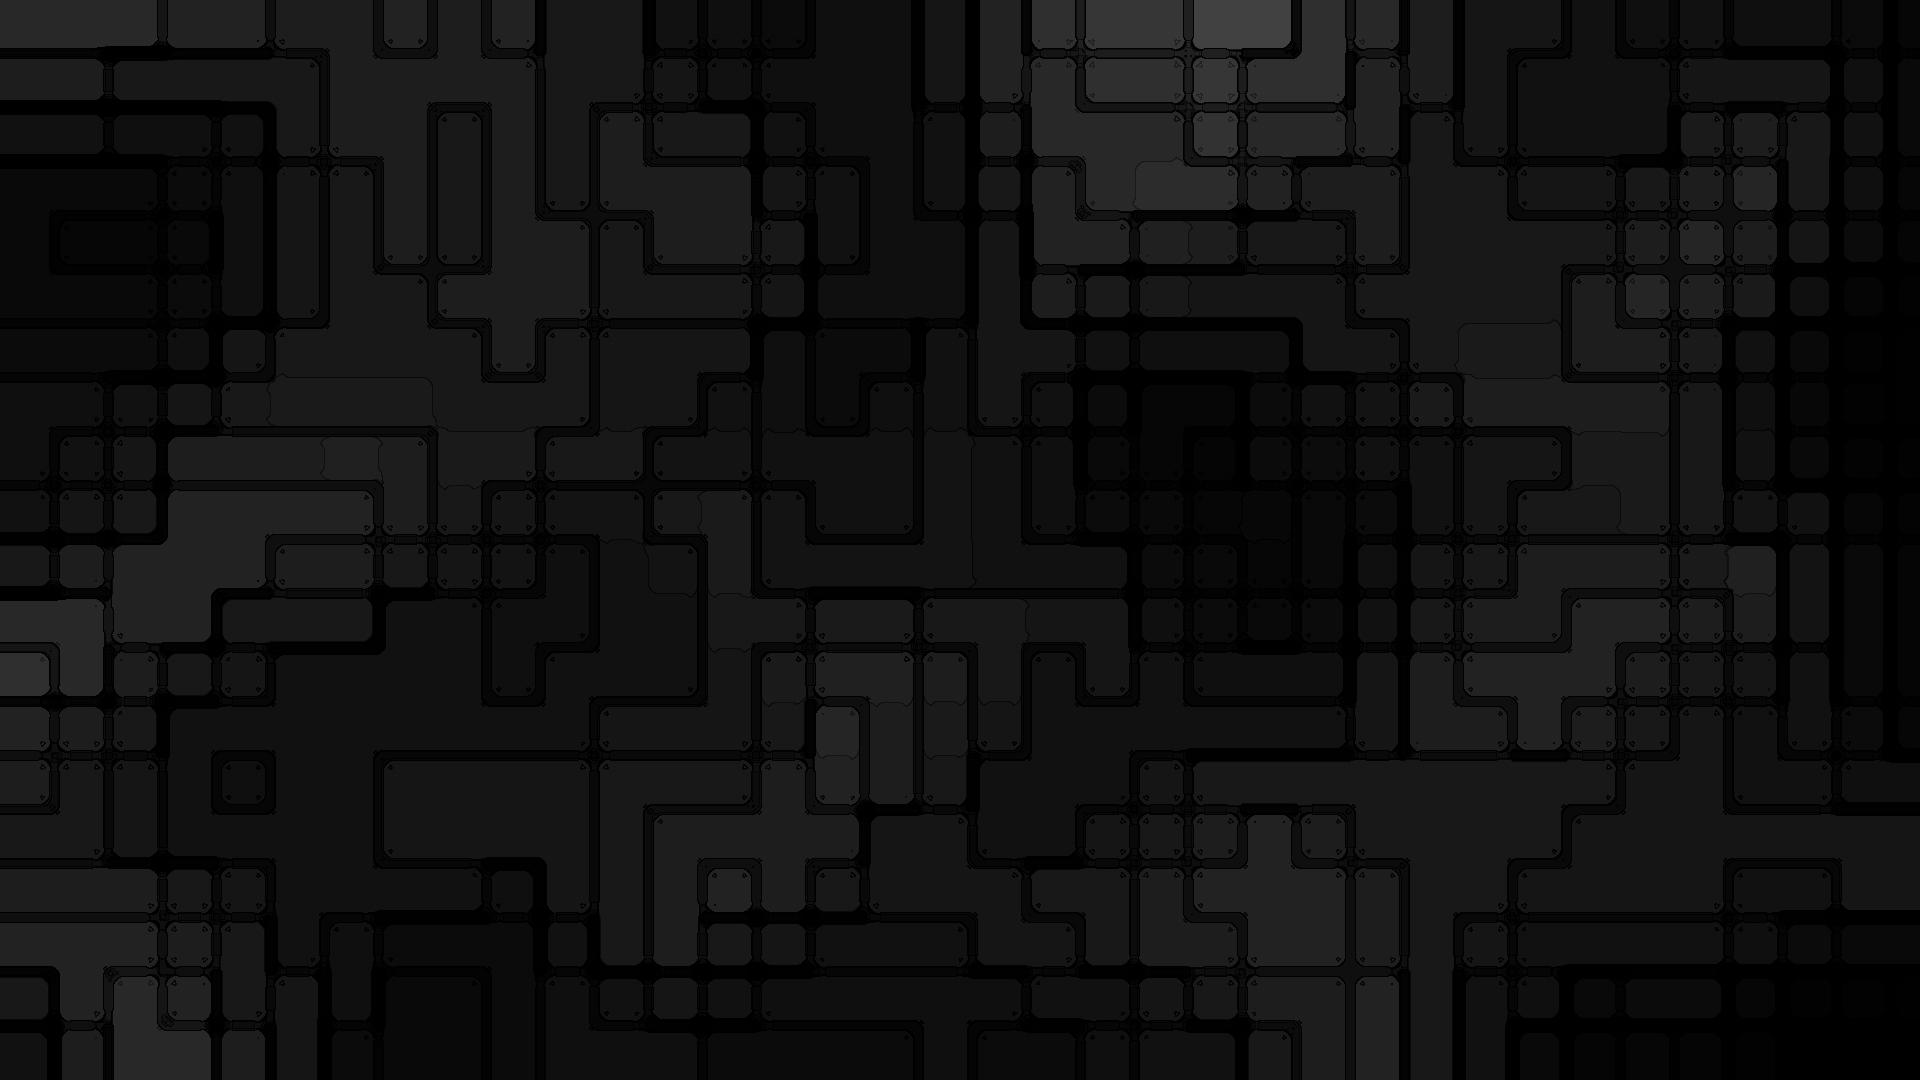 3d Graffiti Wallpaper 1080 Abstract Grey Wallpaper Hd Pixelstalk Net